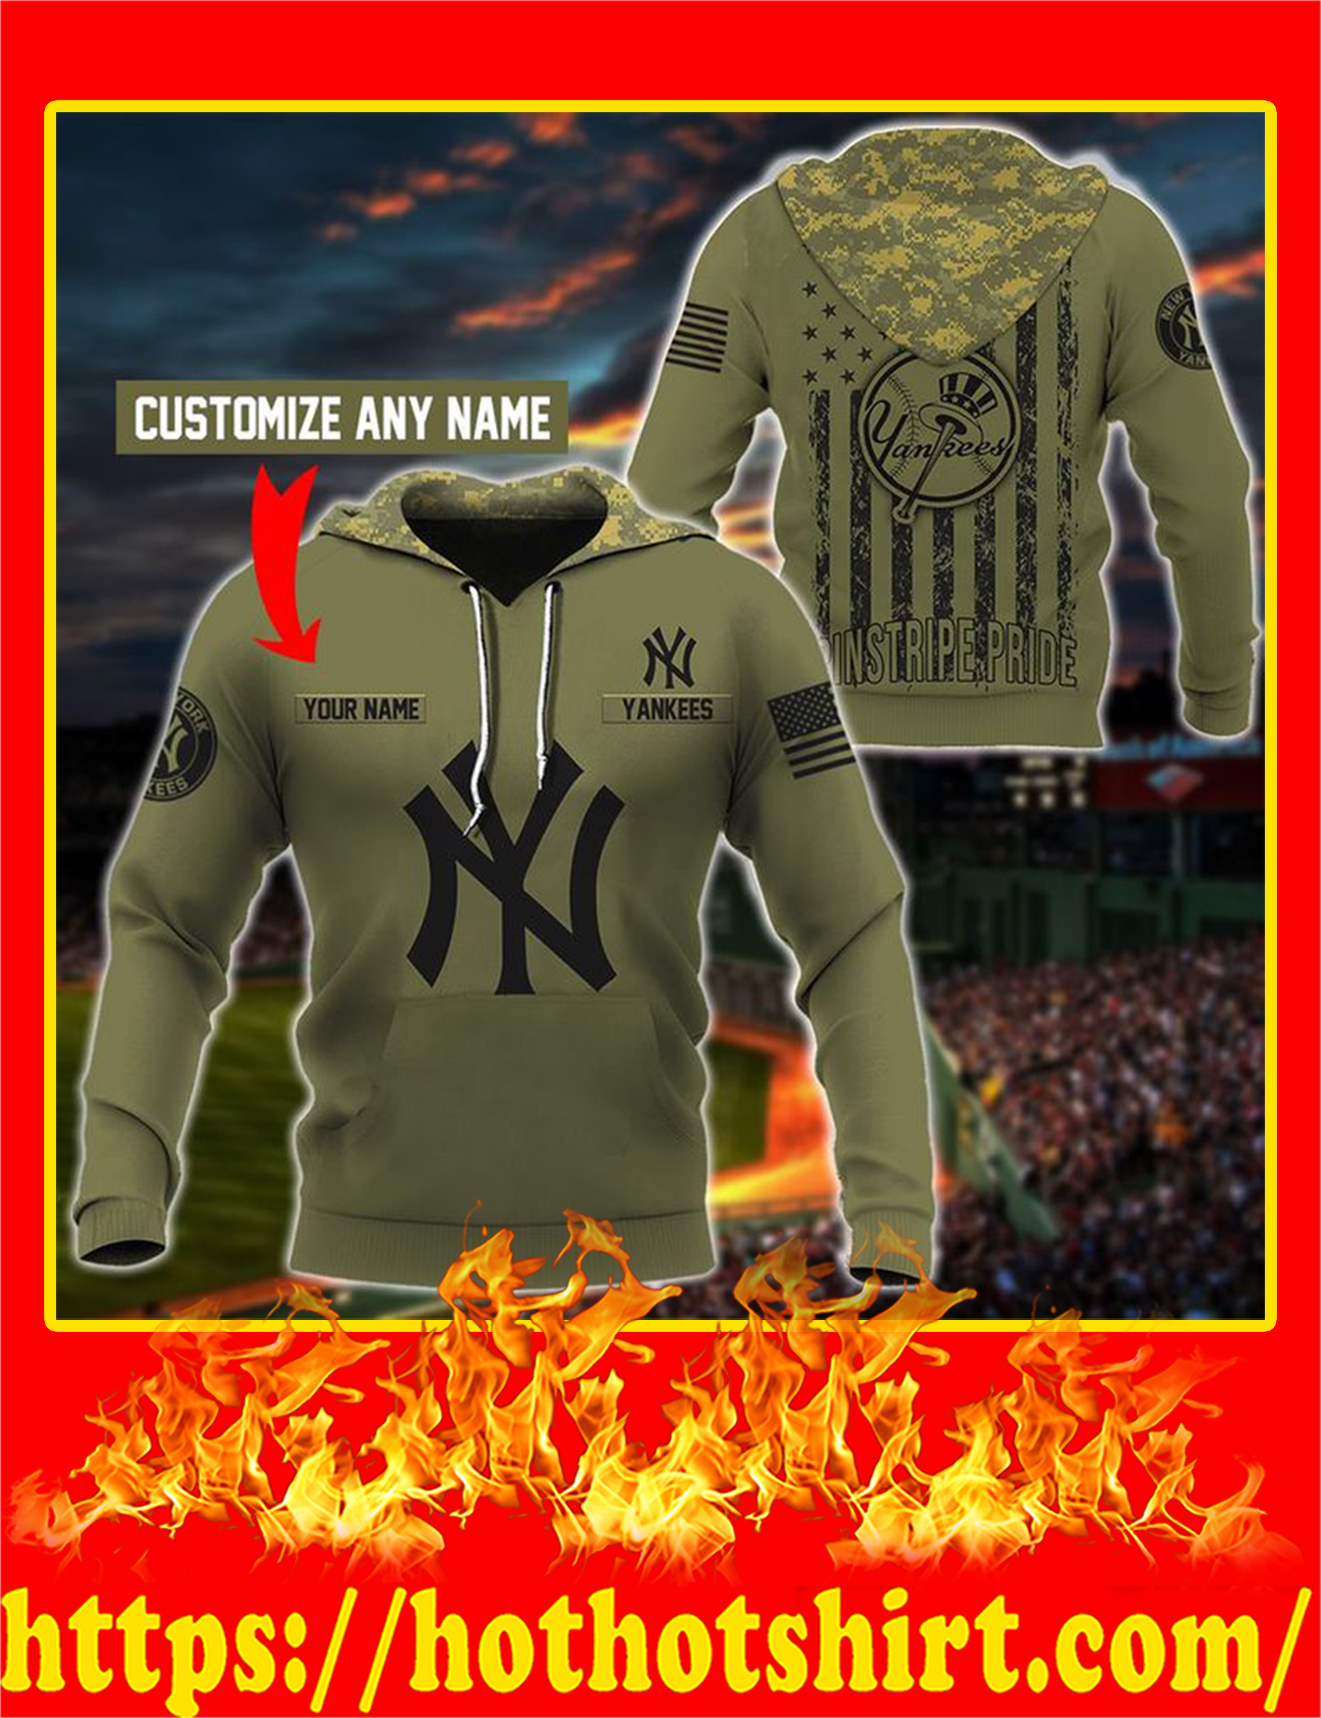 Yankees Customize Custom Name 3D Hoodie - XL